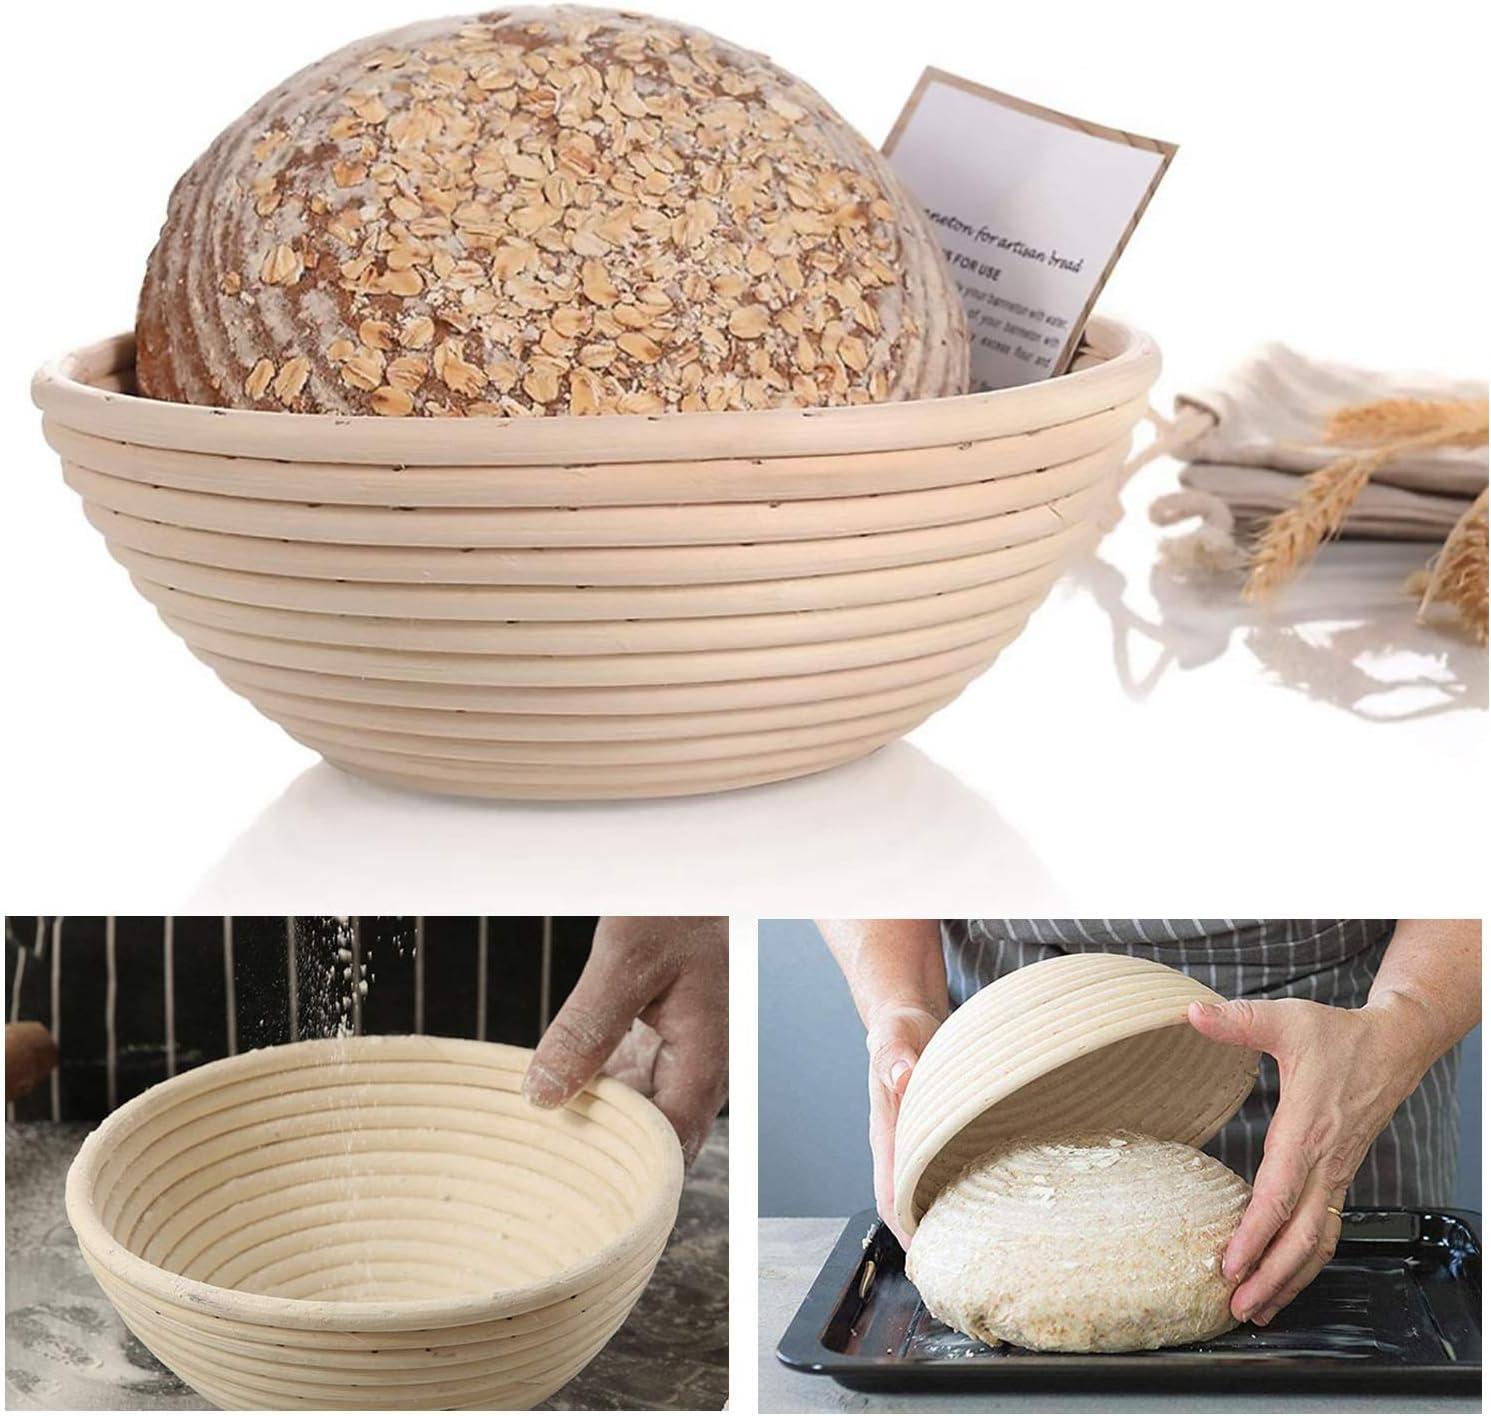 Handmade bread fermentation basket Round bread basket 8.8-inch Natural rattan fermentation basket Linen dough interlining